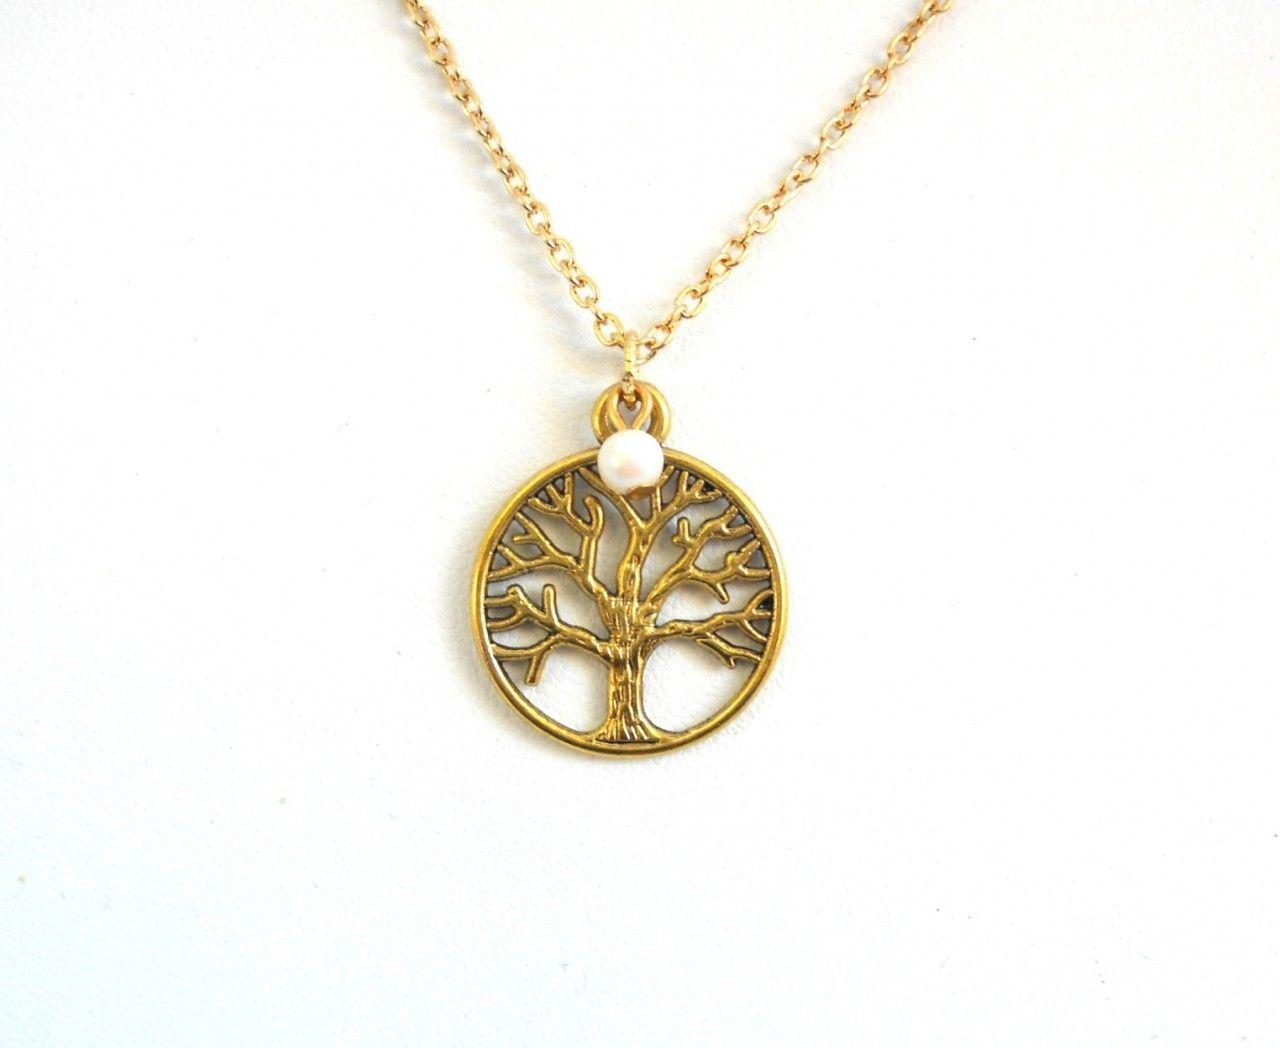 Green Eyed Lady - Tree of Life Necklace, $13.99 (http://www.shopgreeneyedlady.com/jewelry/necklaces/tree-of-life-necklace/)